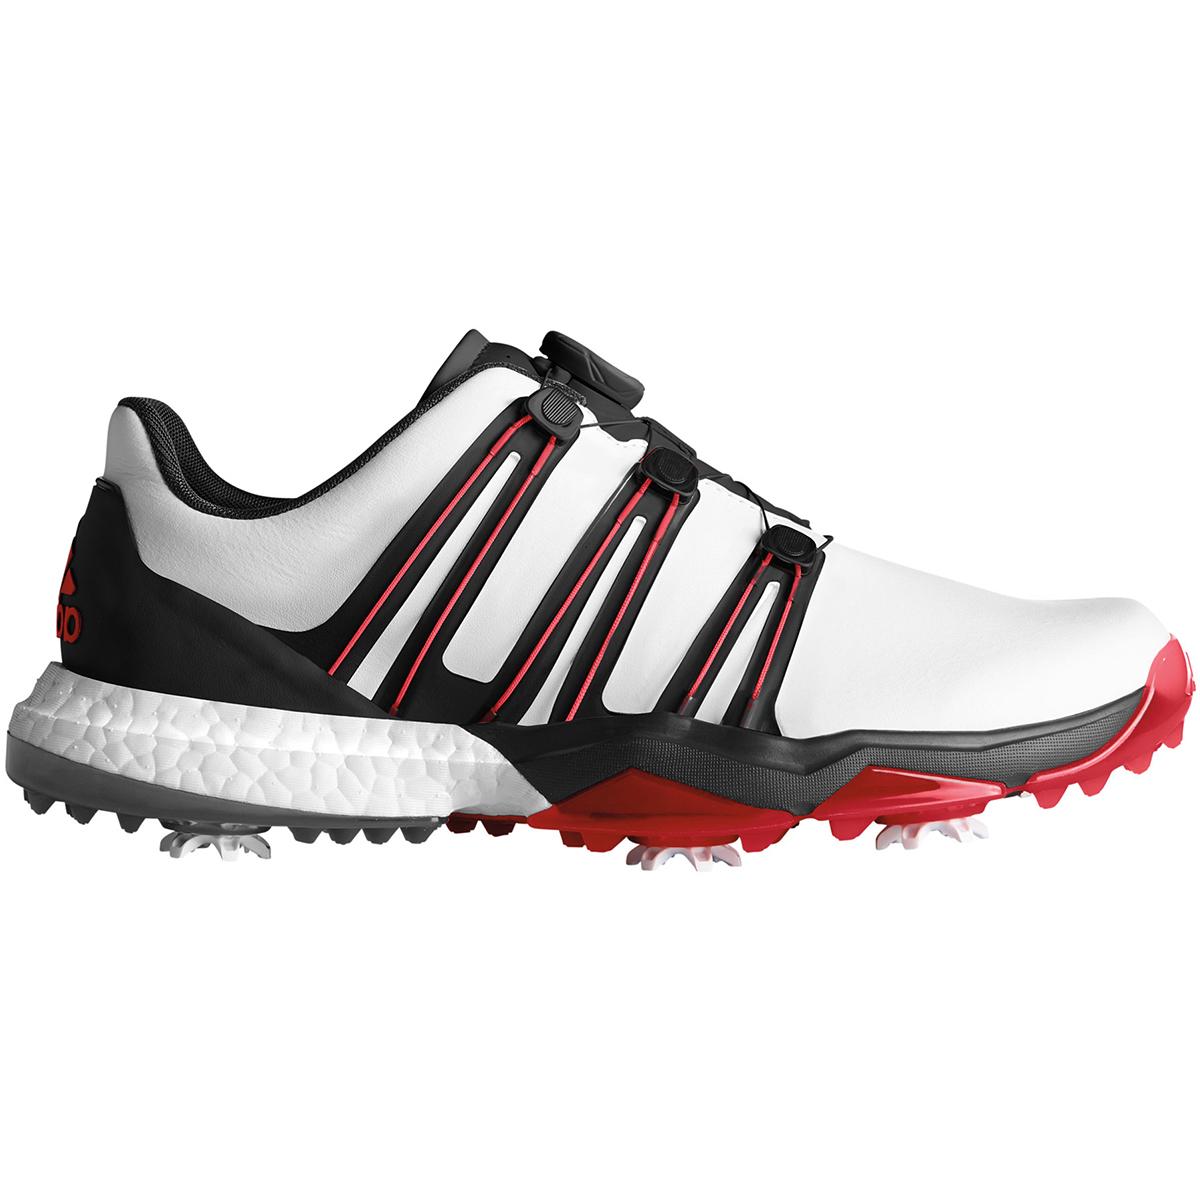 chiodi per scarpe da golf adidas